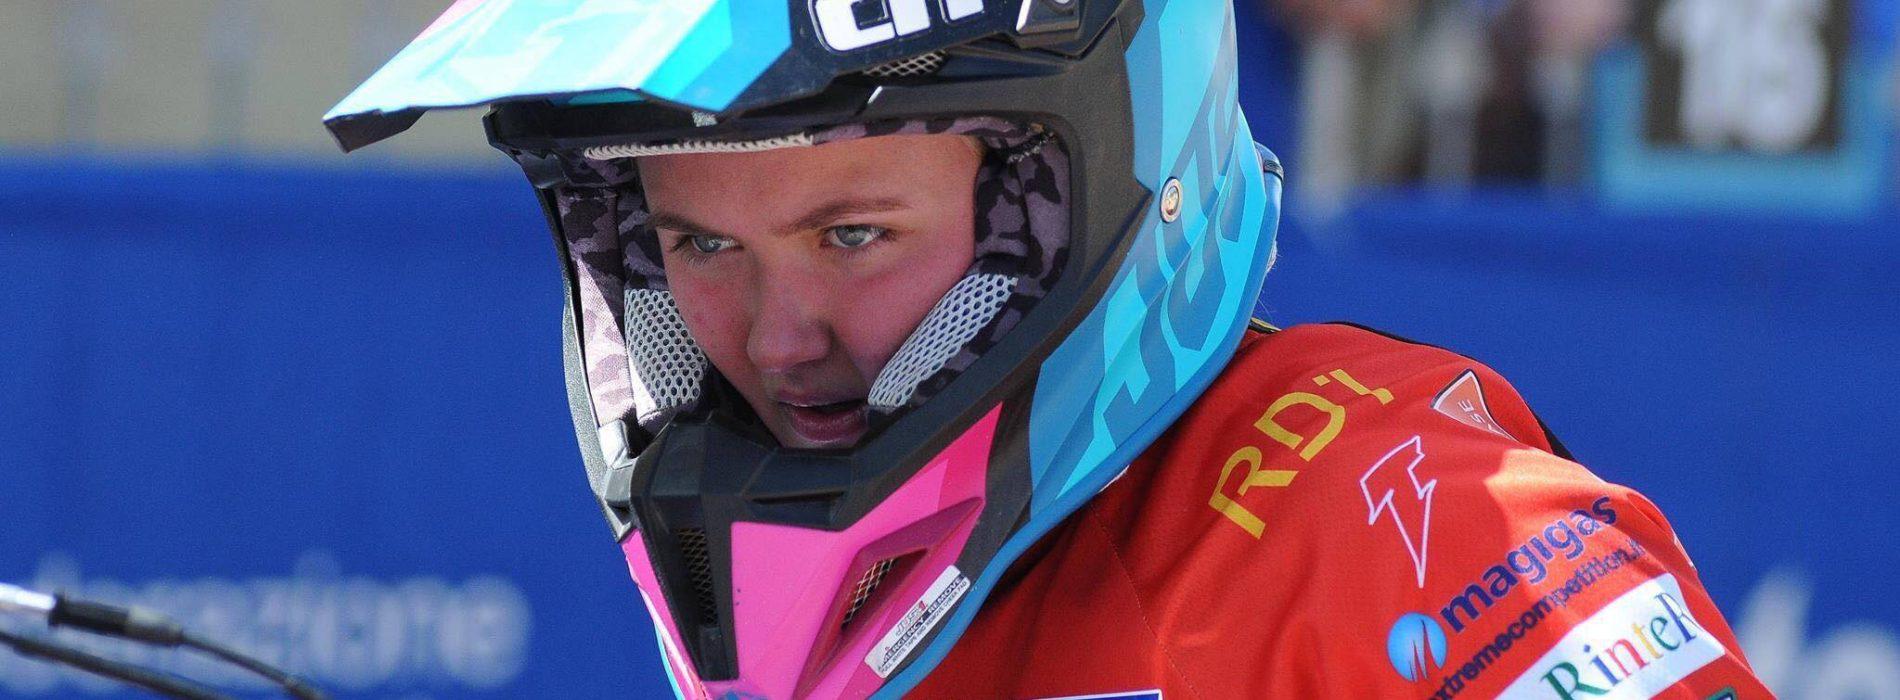 Lynn Valk ready to race EMX Women Round 3 and WMX Round 2